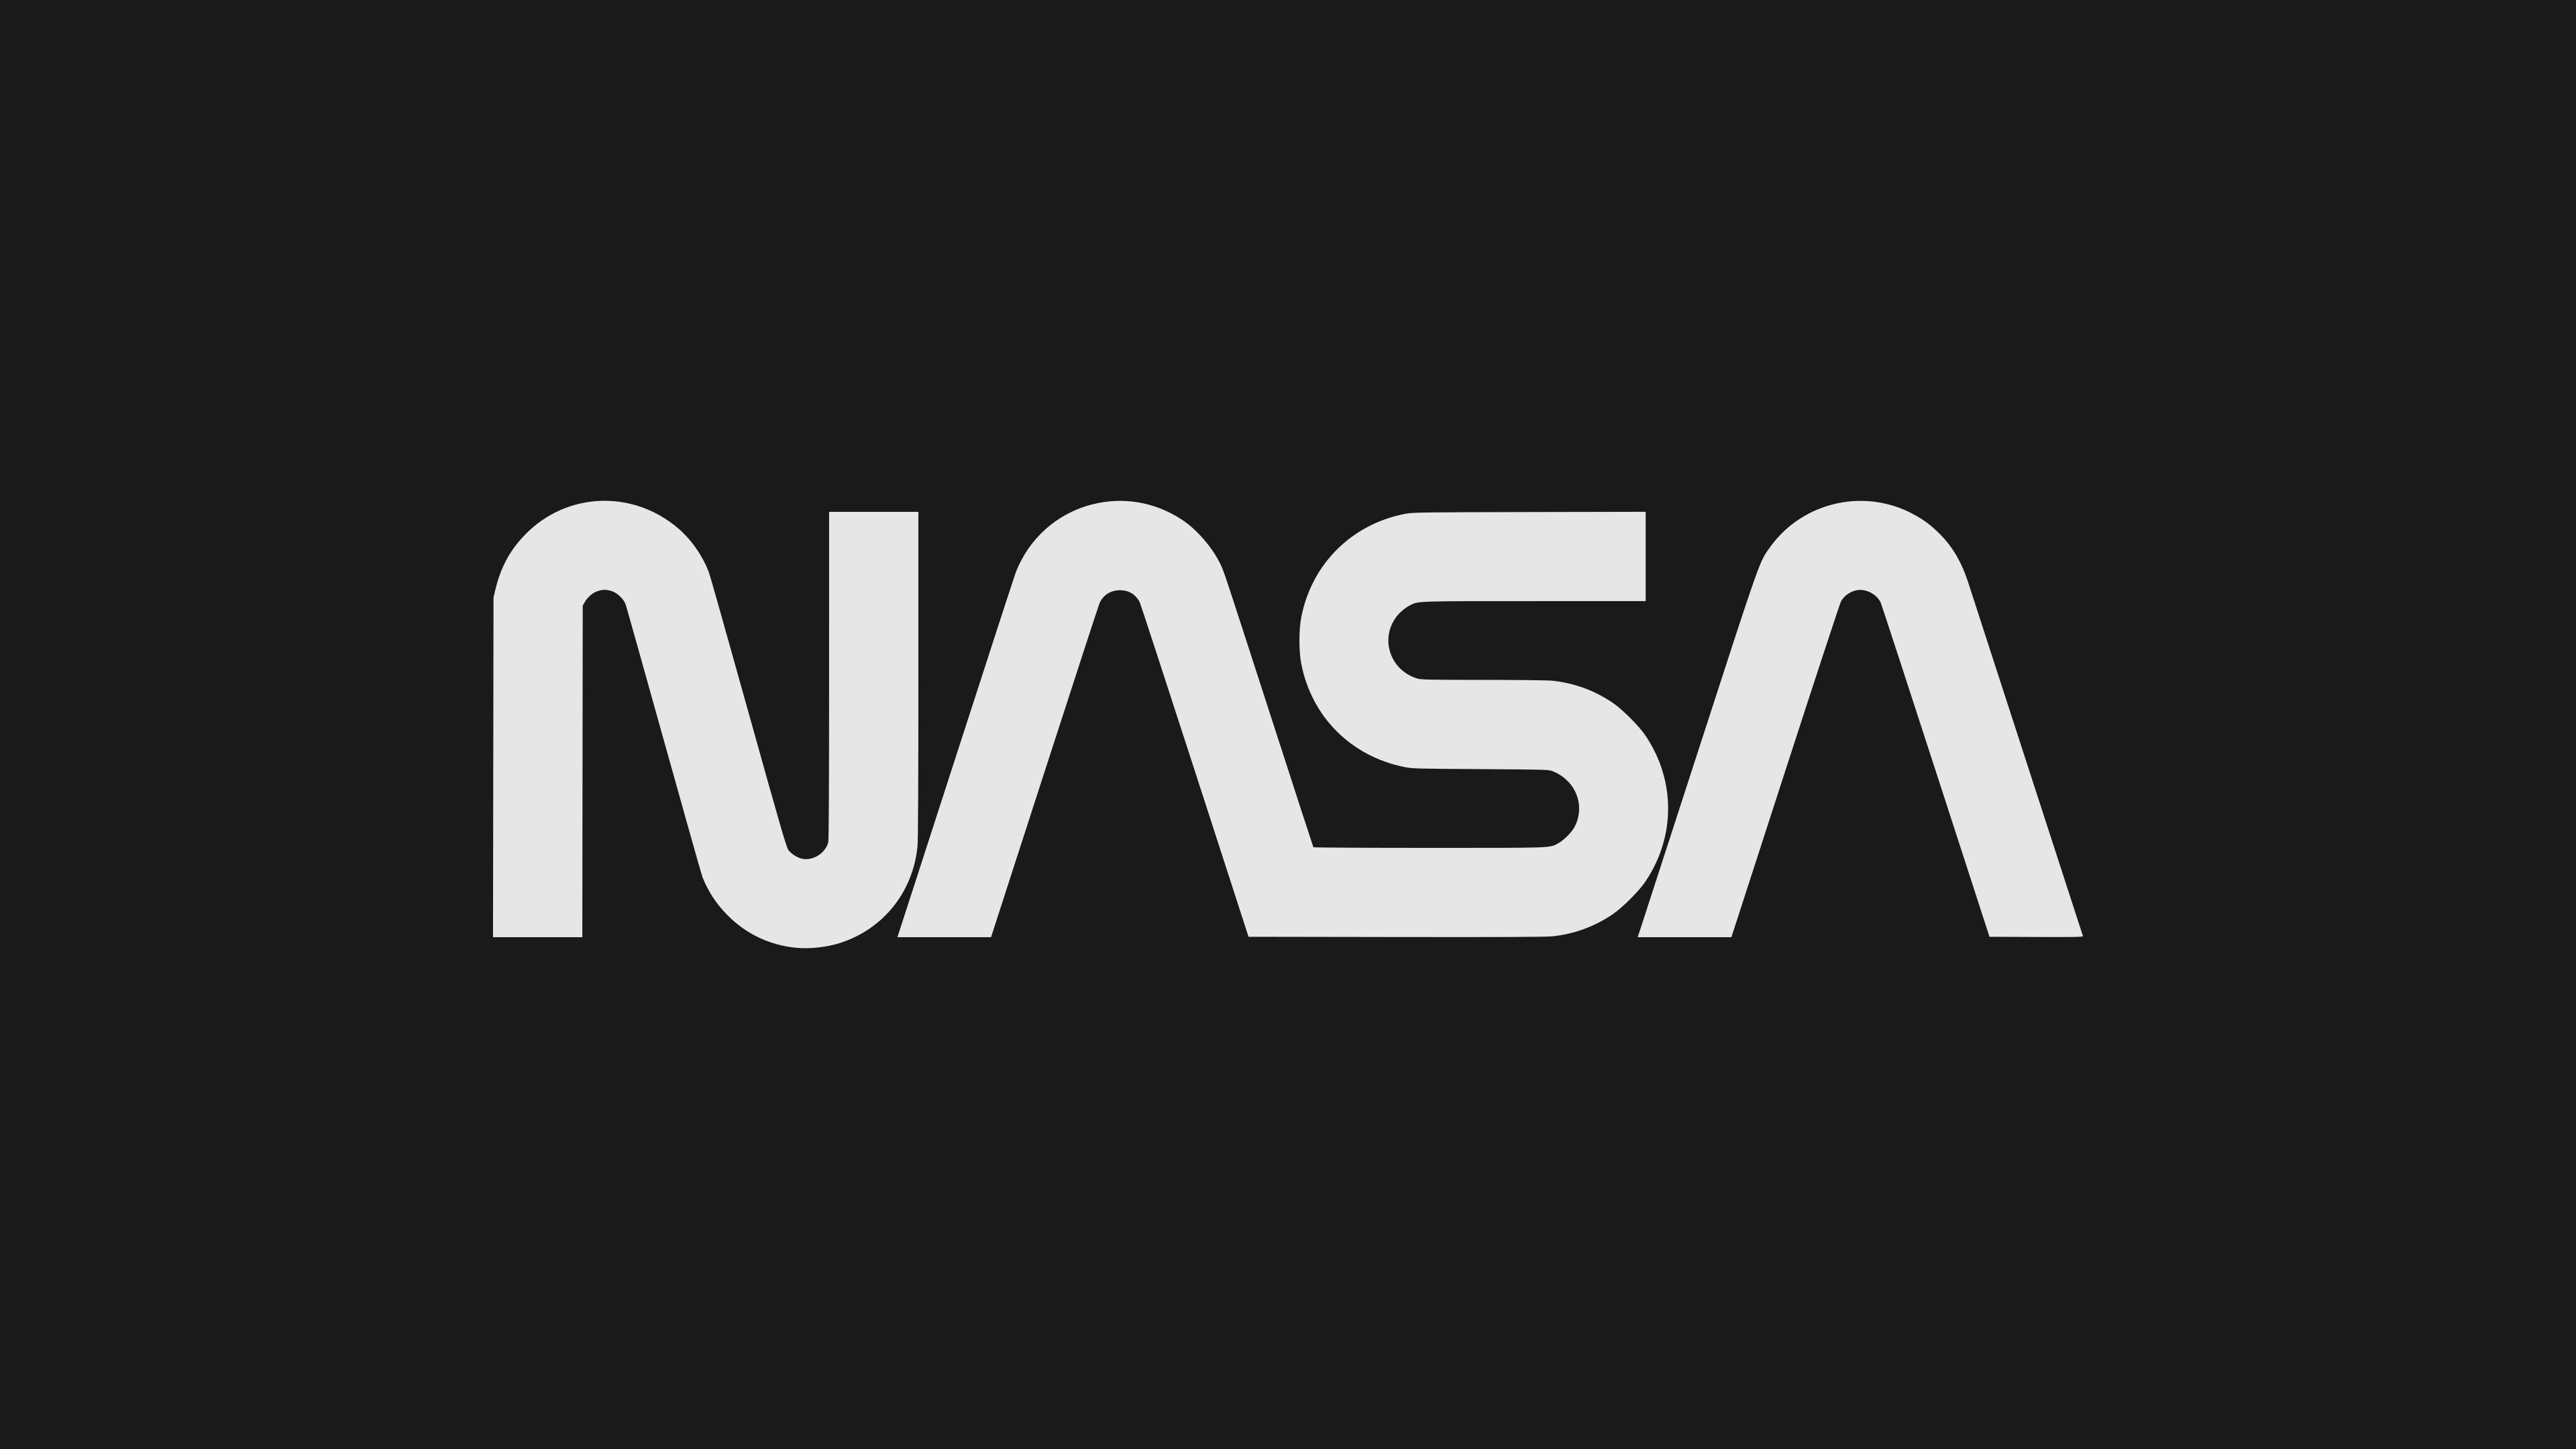 Simply NASA 4K wallpaper